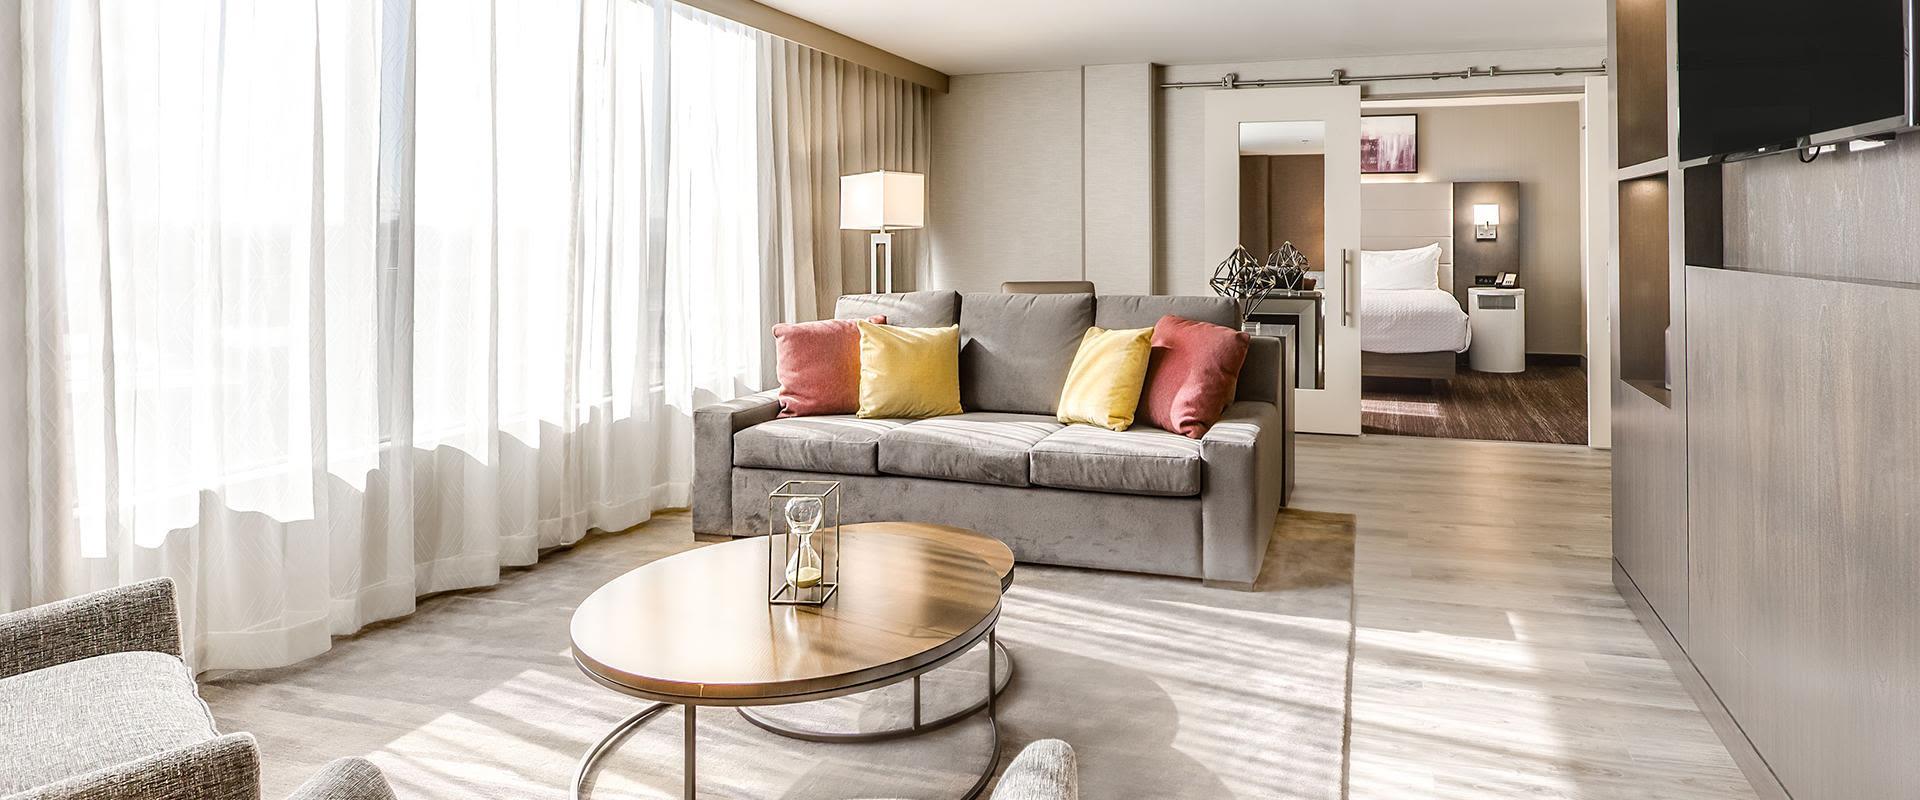 Denver Presidential Suite Sitting Area